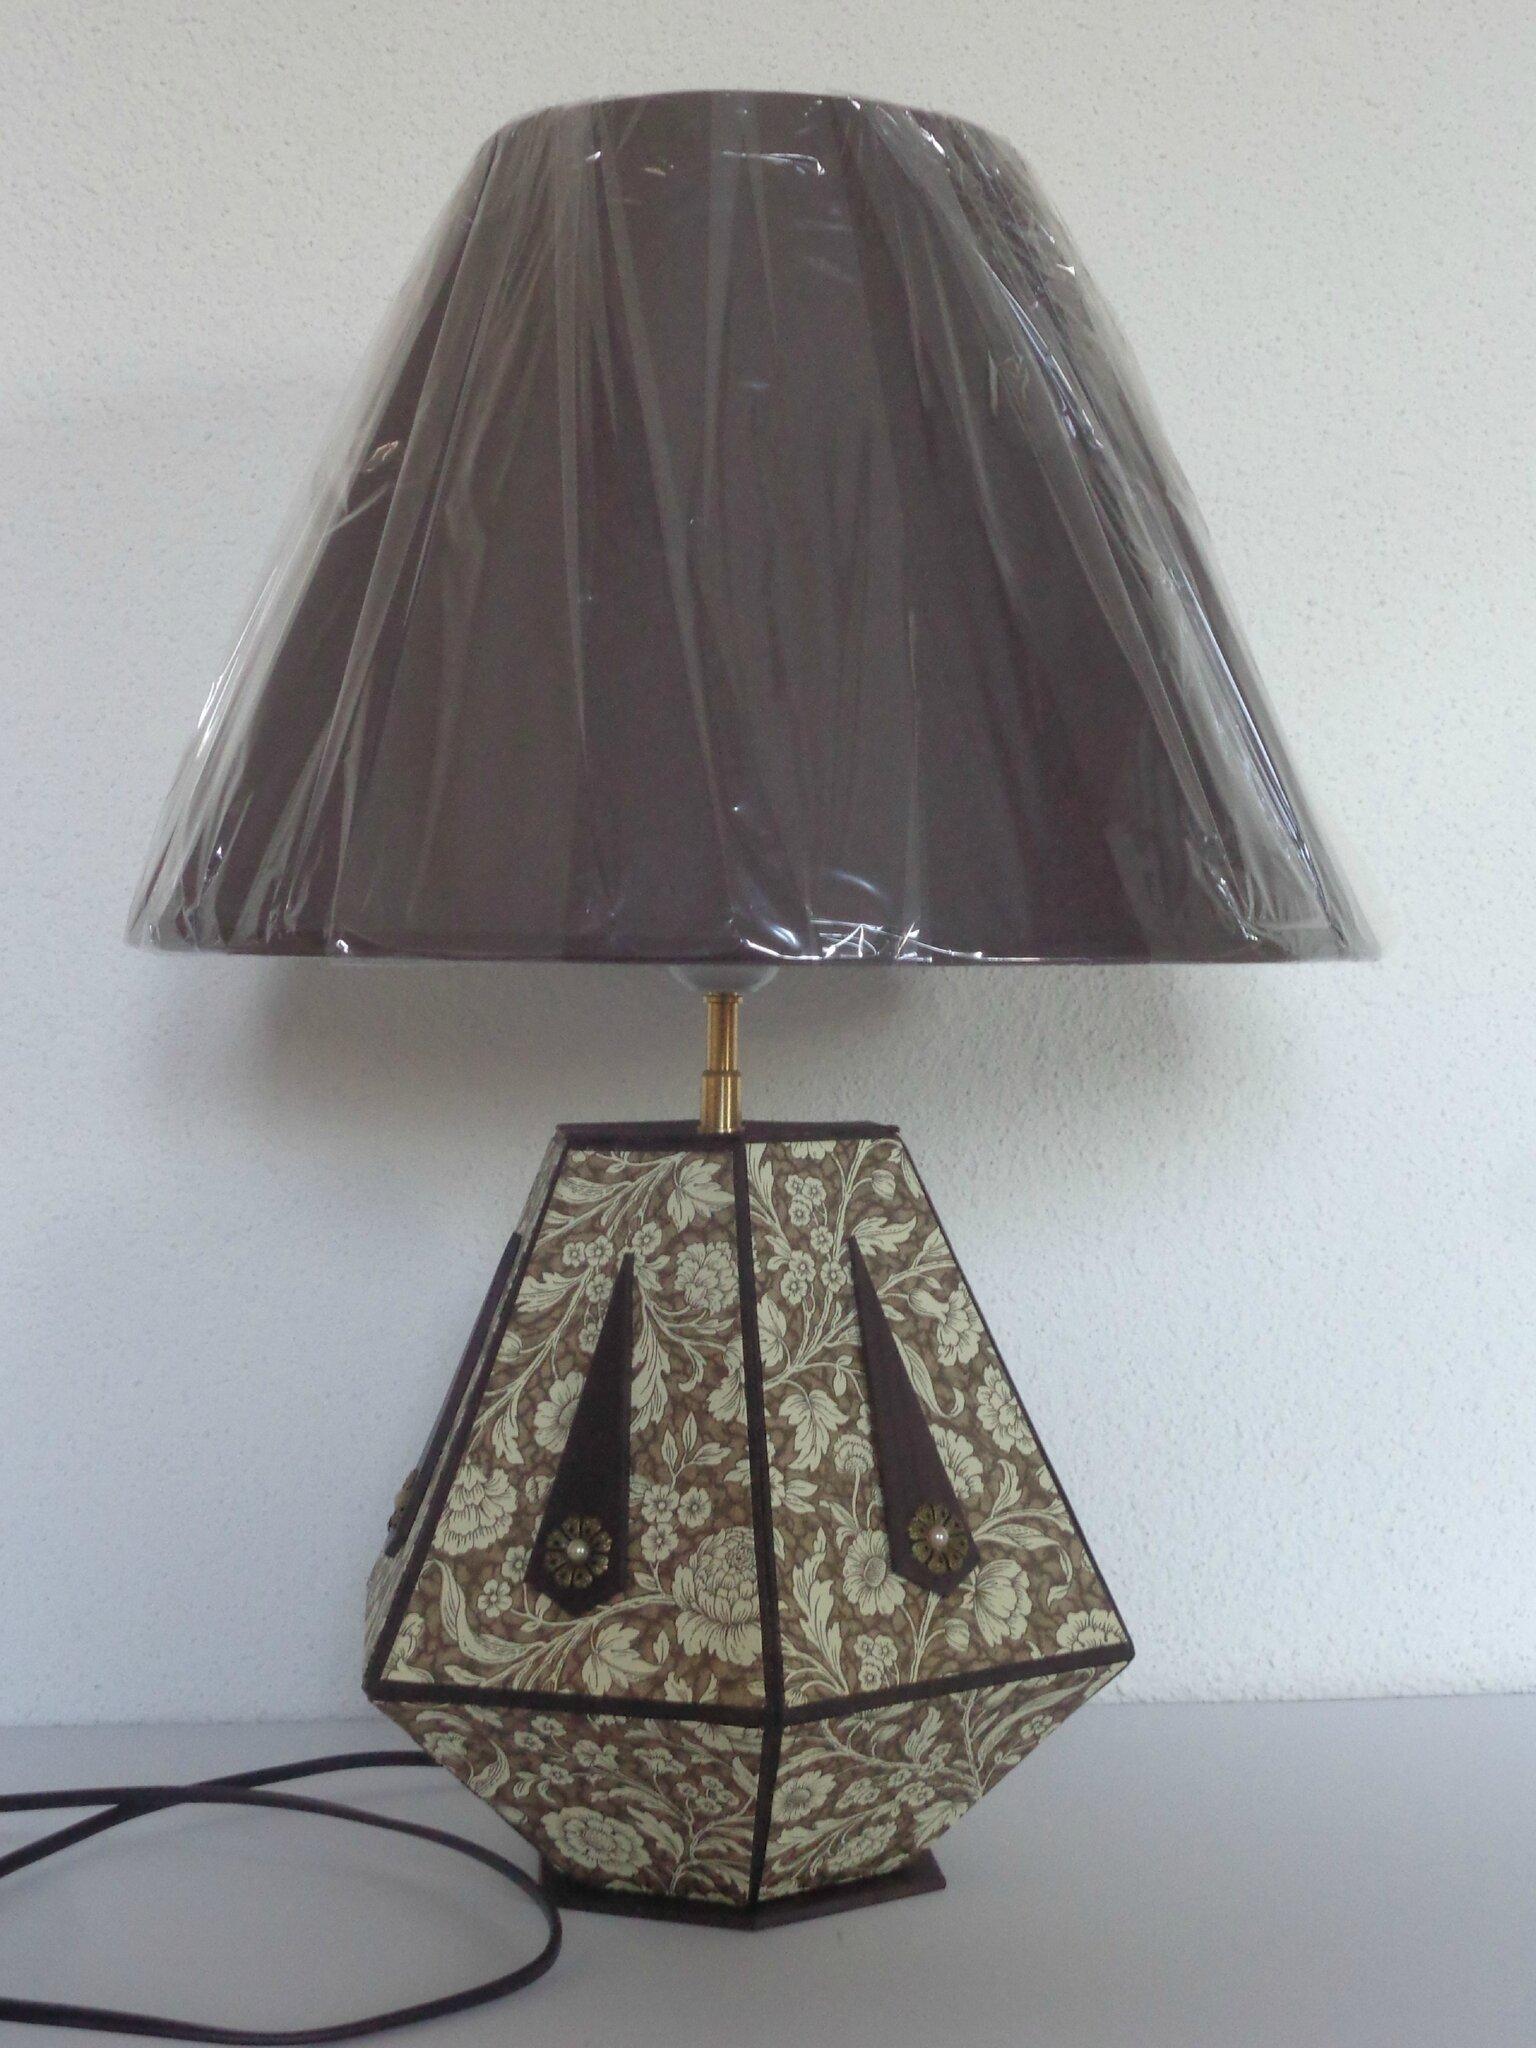 Lampe hexagonale et sa boite